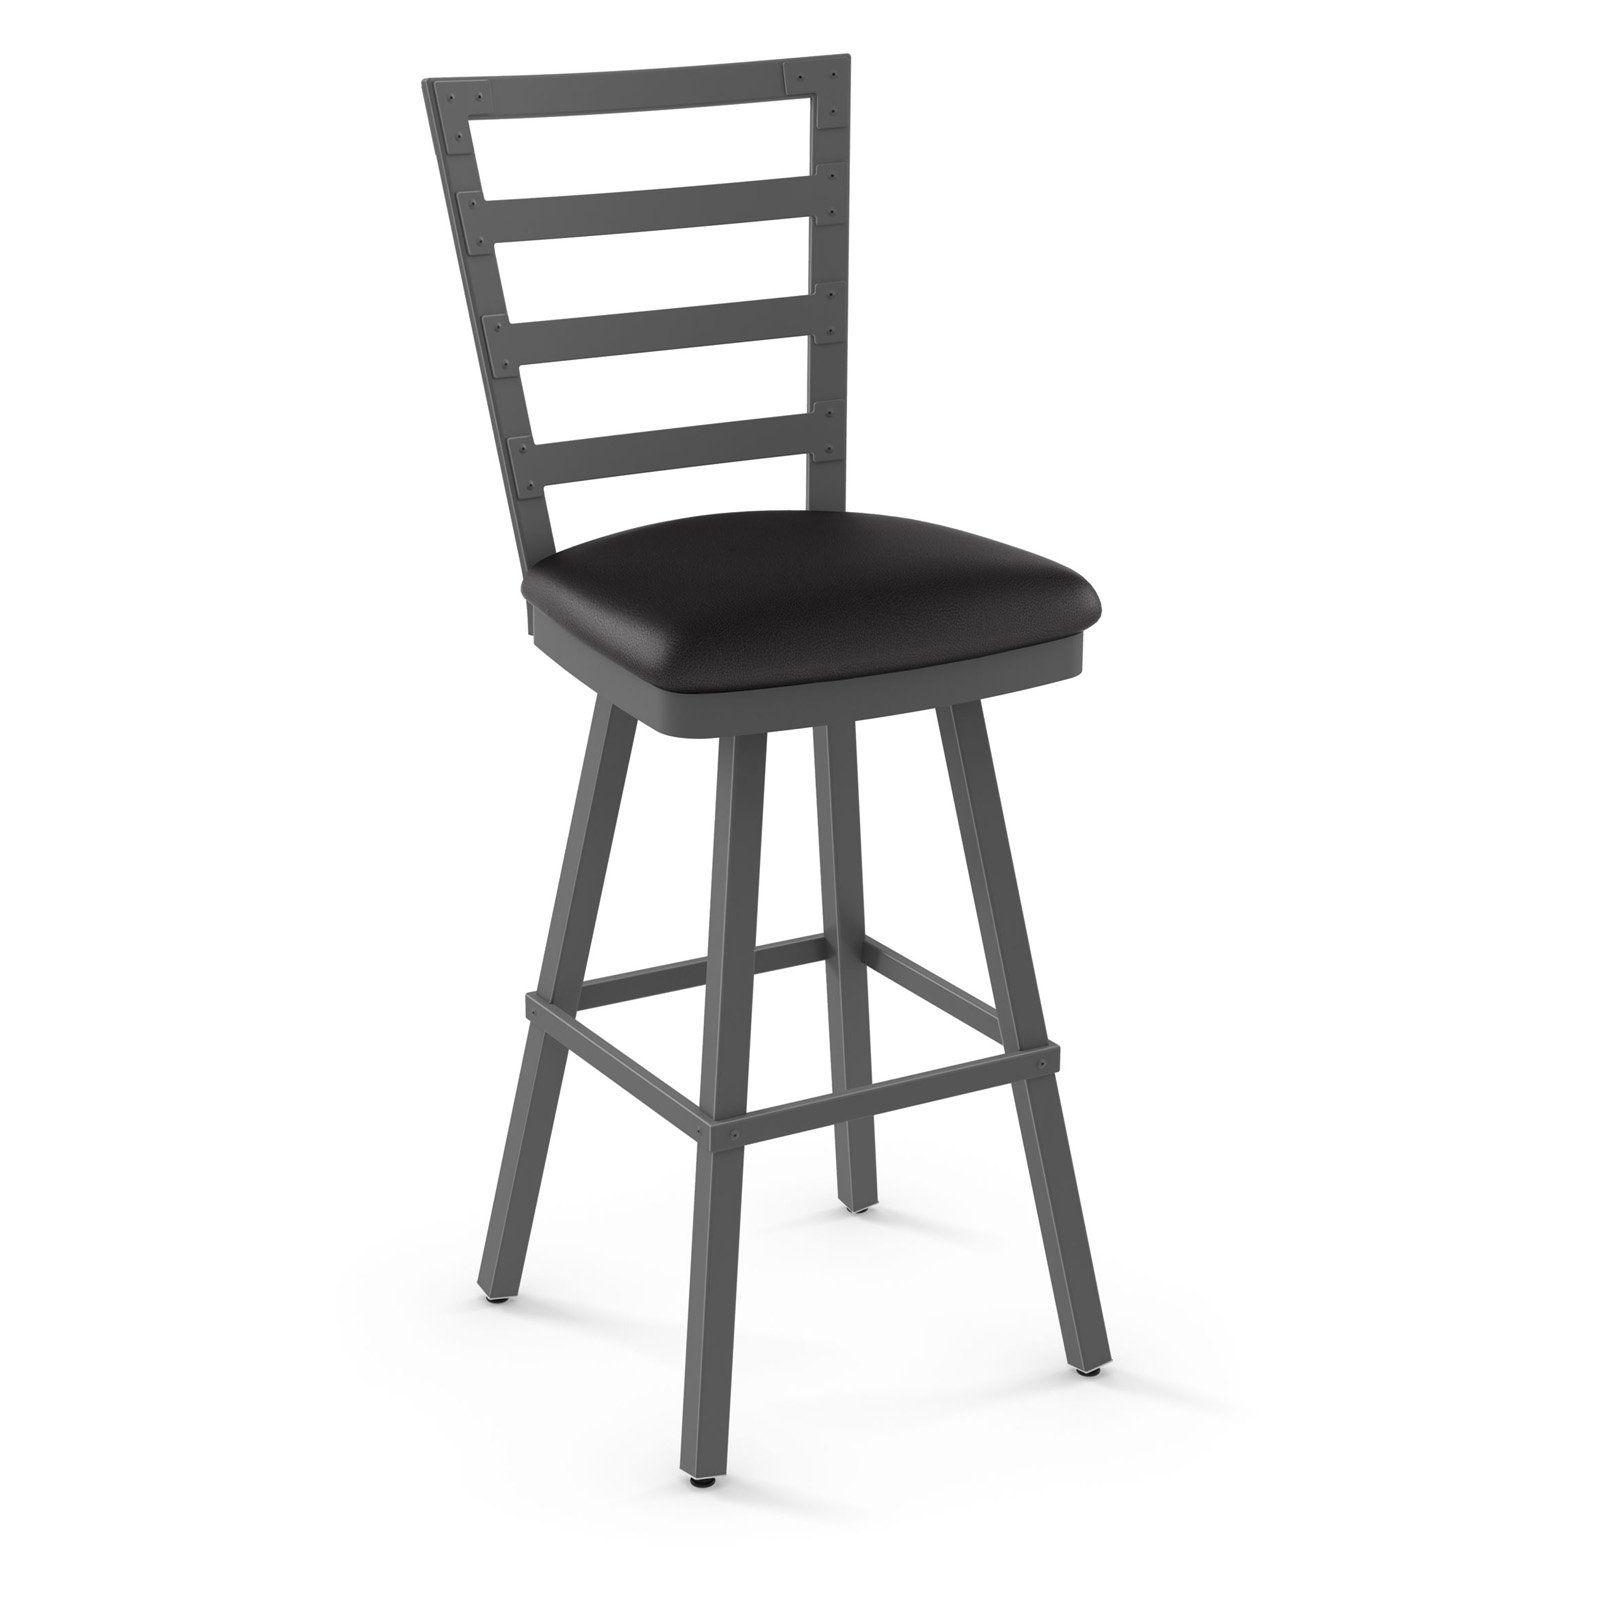 Tremendous Amisco Century Swivel Metal Bar Stool Charcoal Black In 2019 Ibusinesslaw Wood Chair Design Ideas Ibusinesslaworg